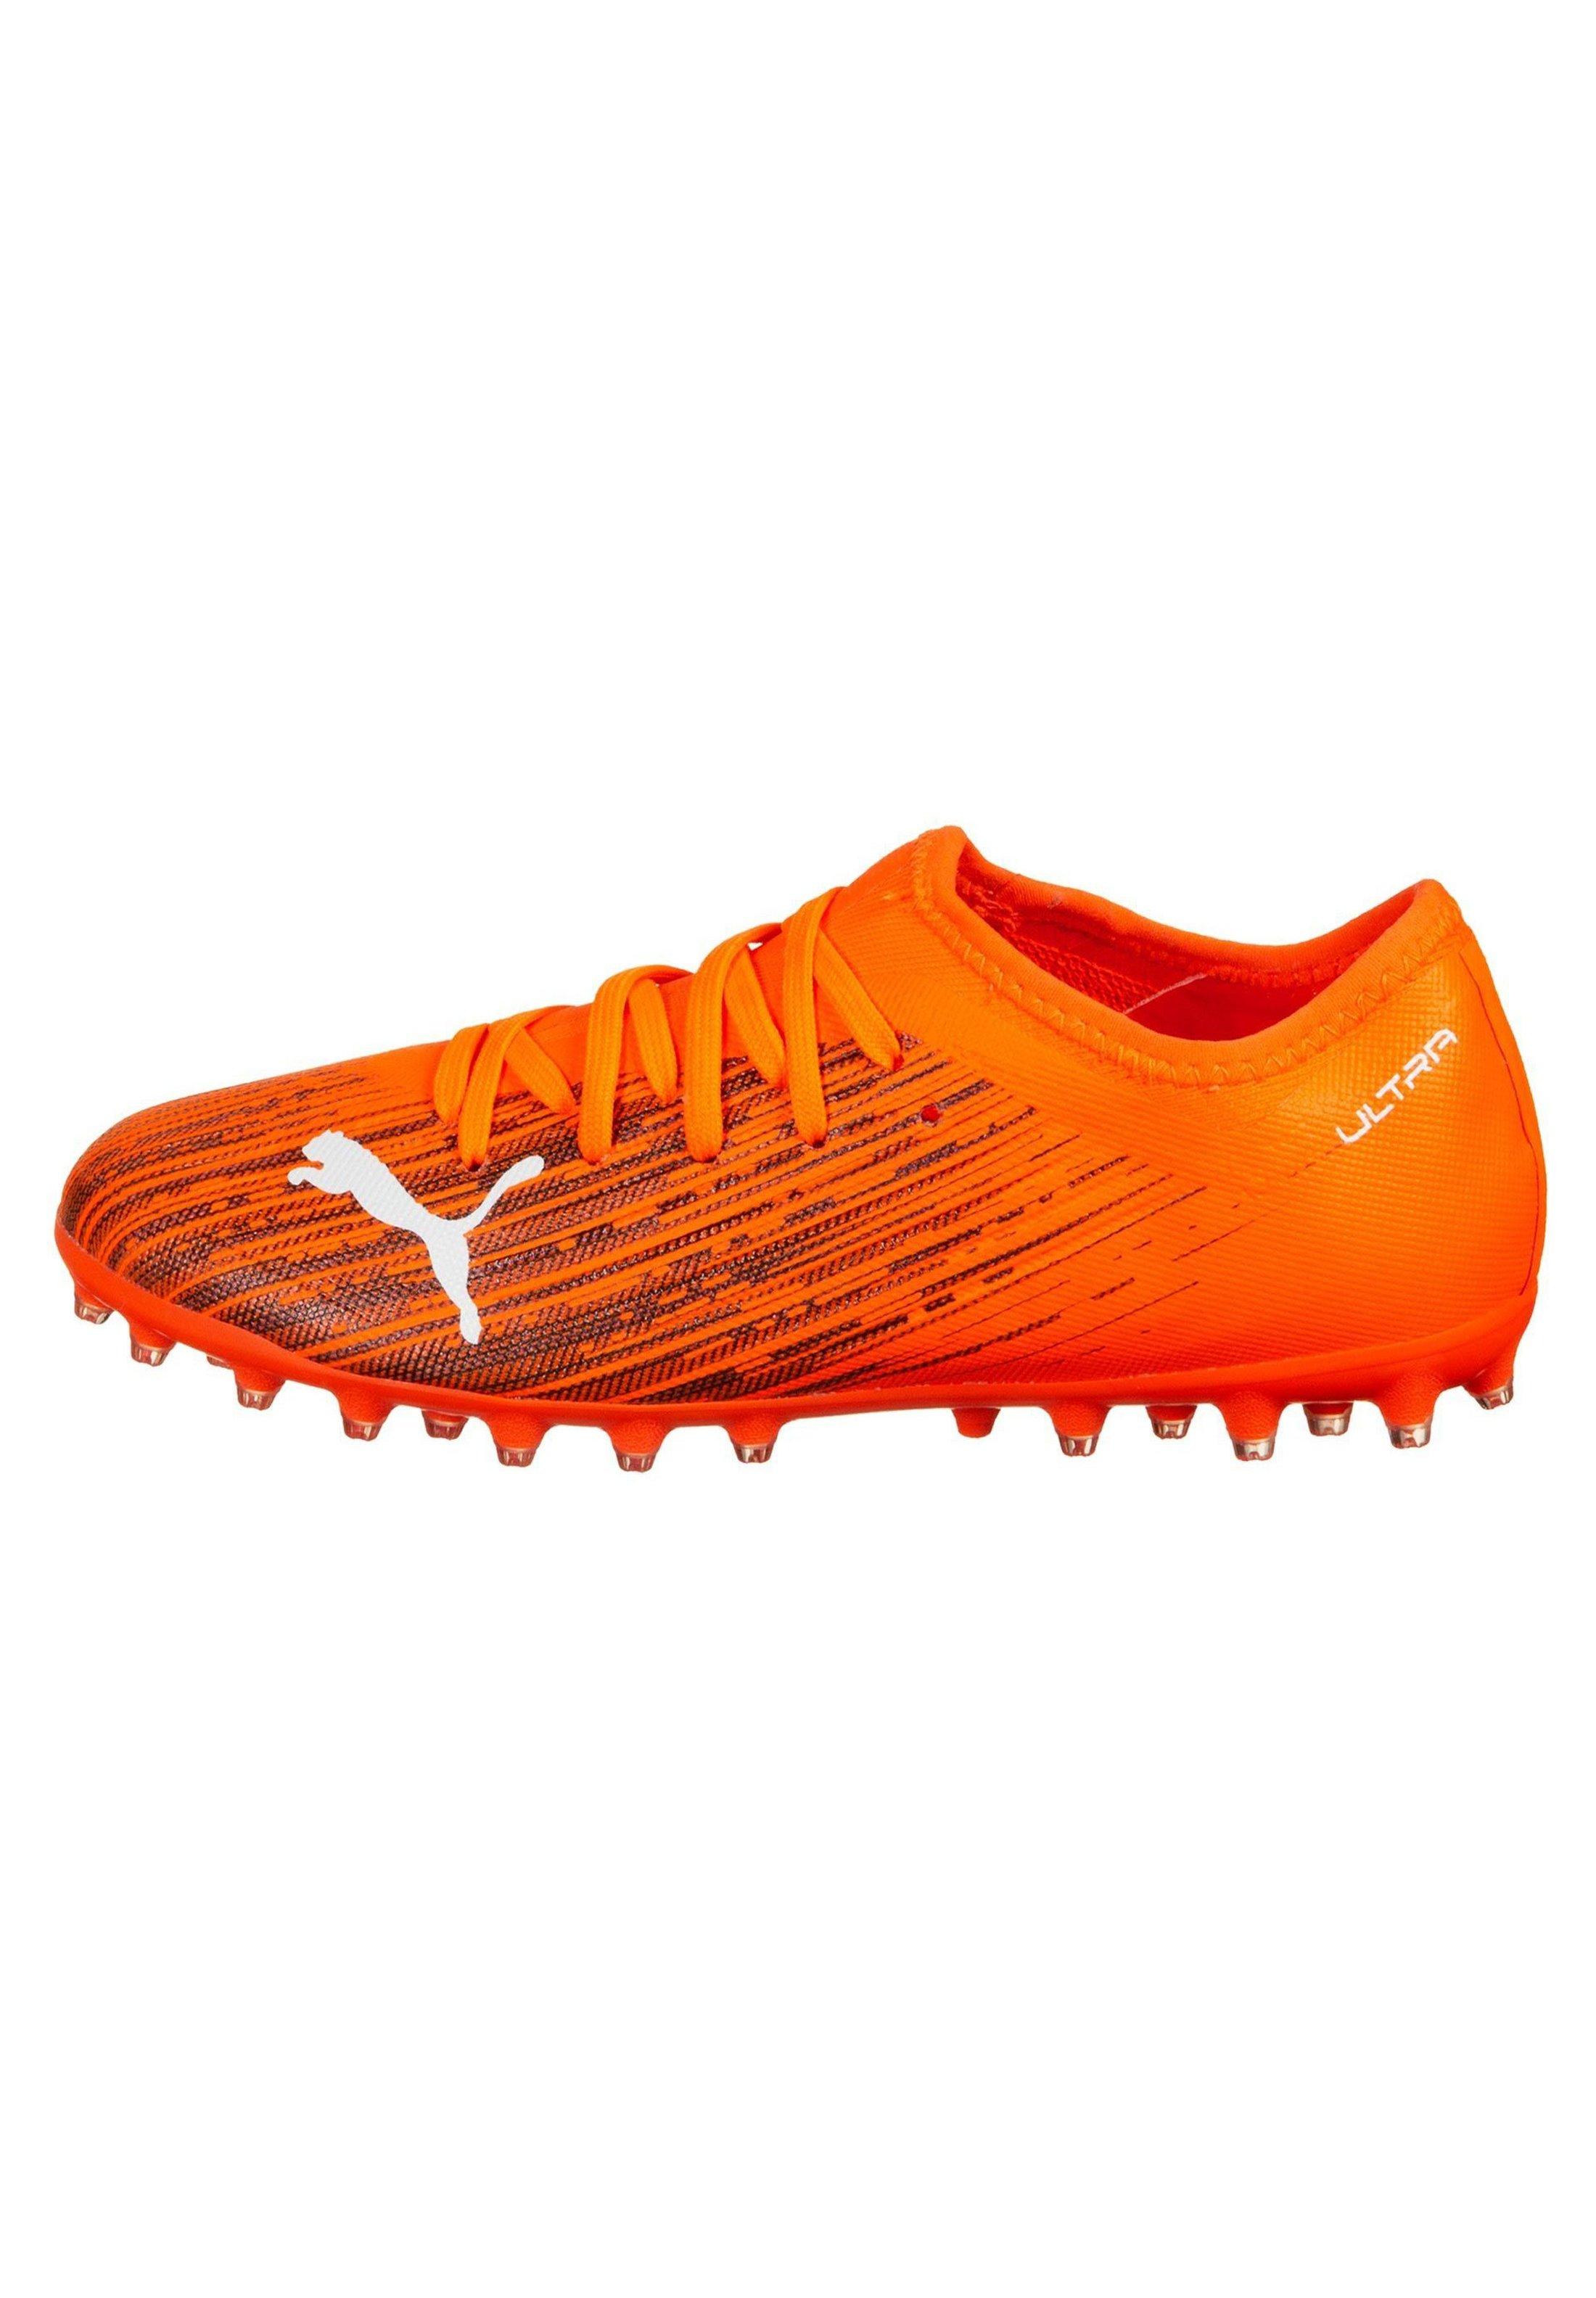 Enfant ULTRA 3.1 MG FUSSBALL - Chaussures de foot à crampons